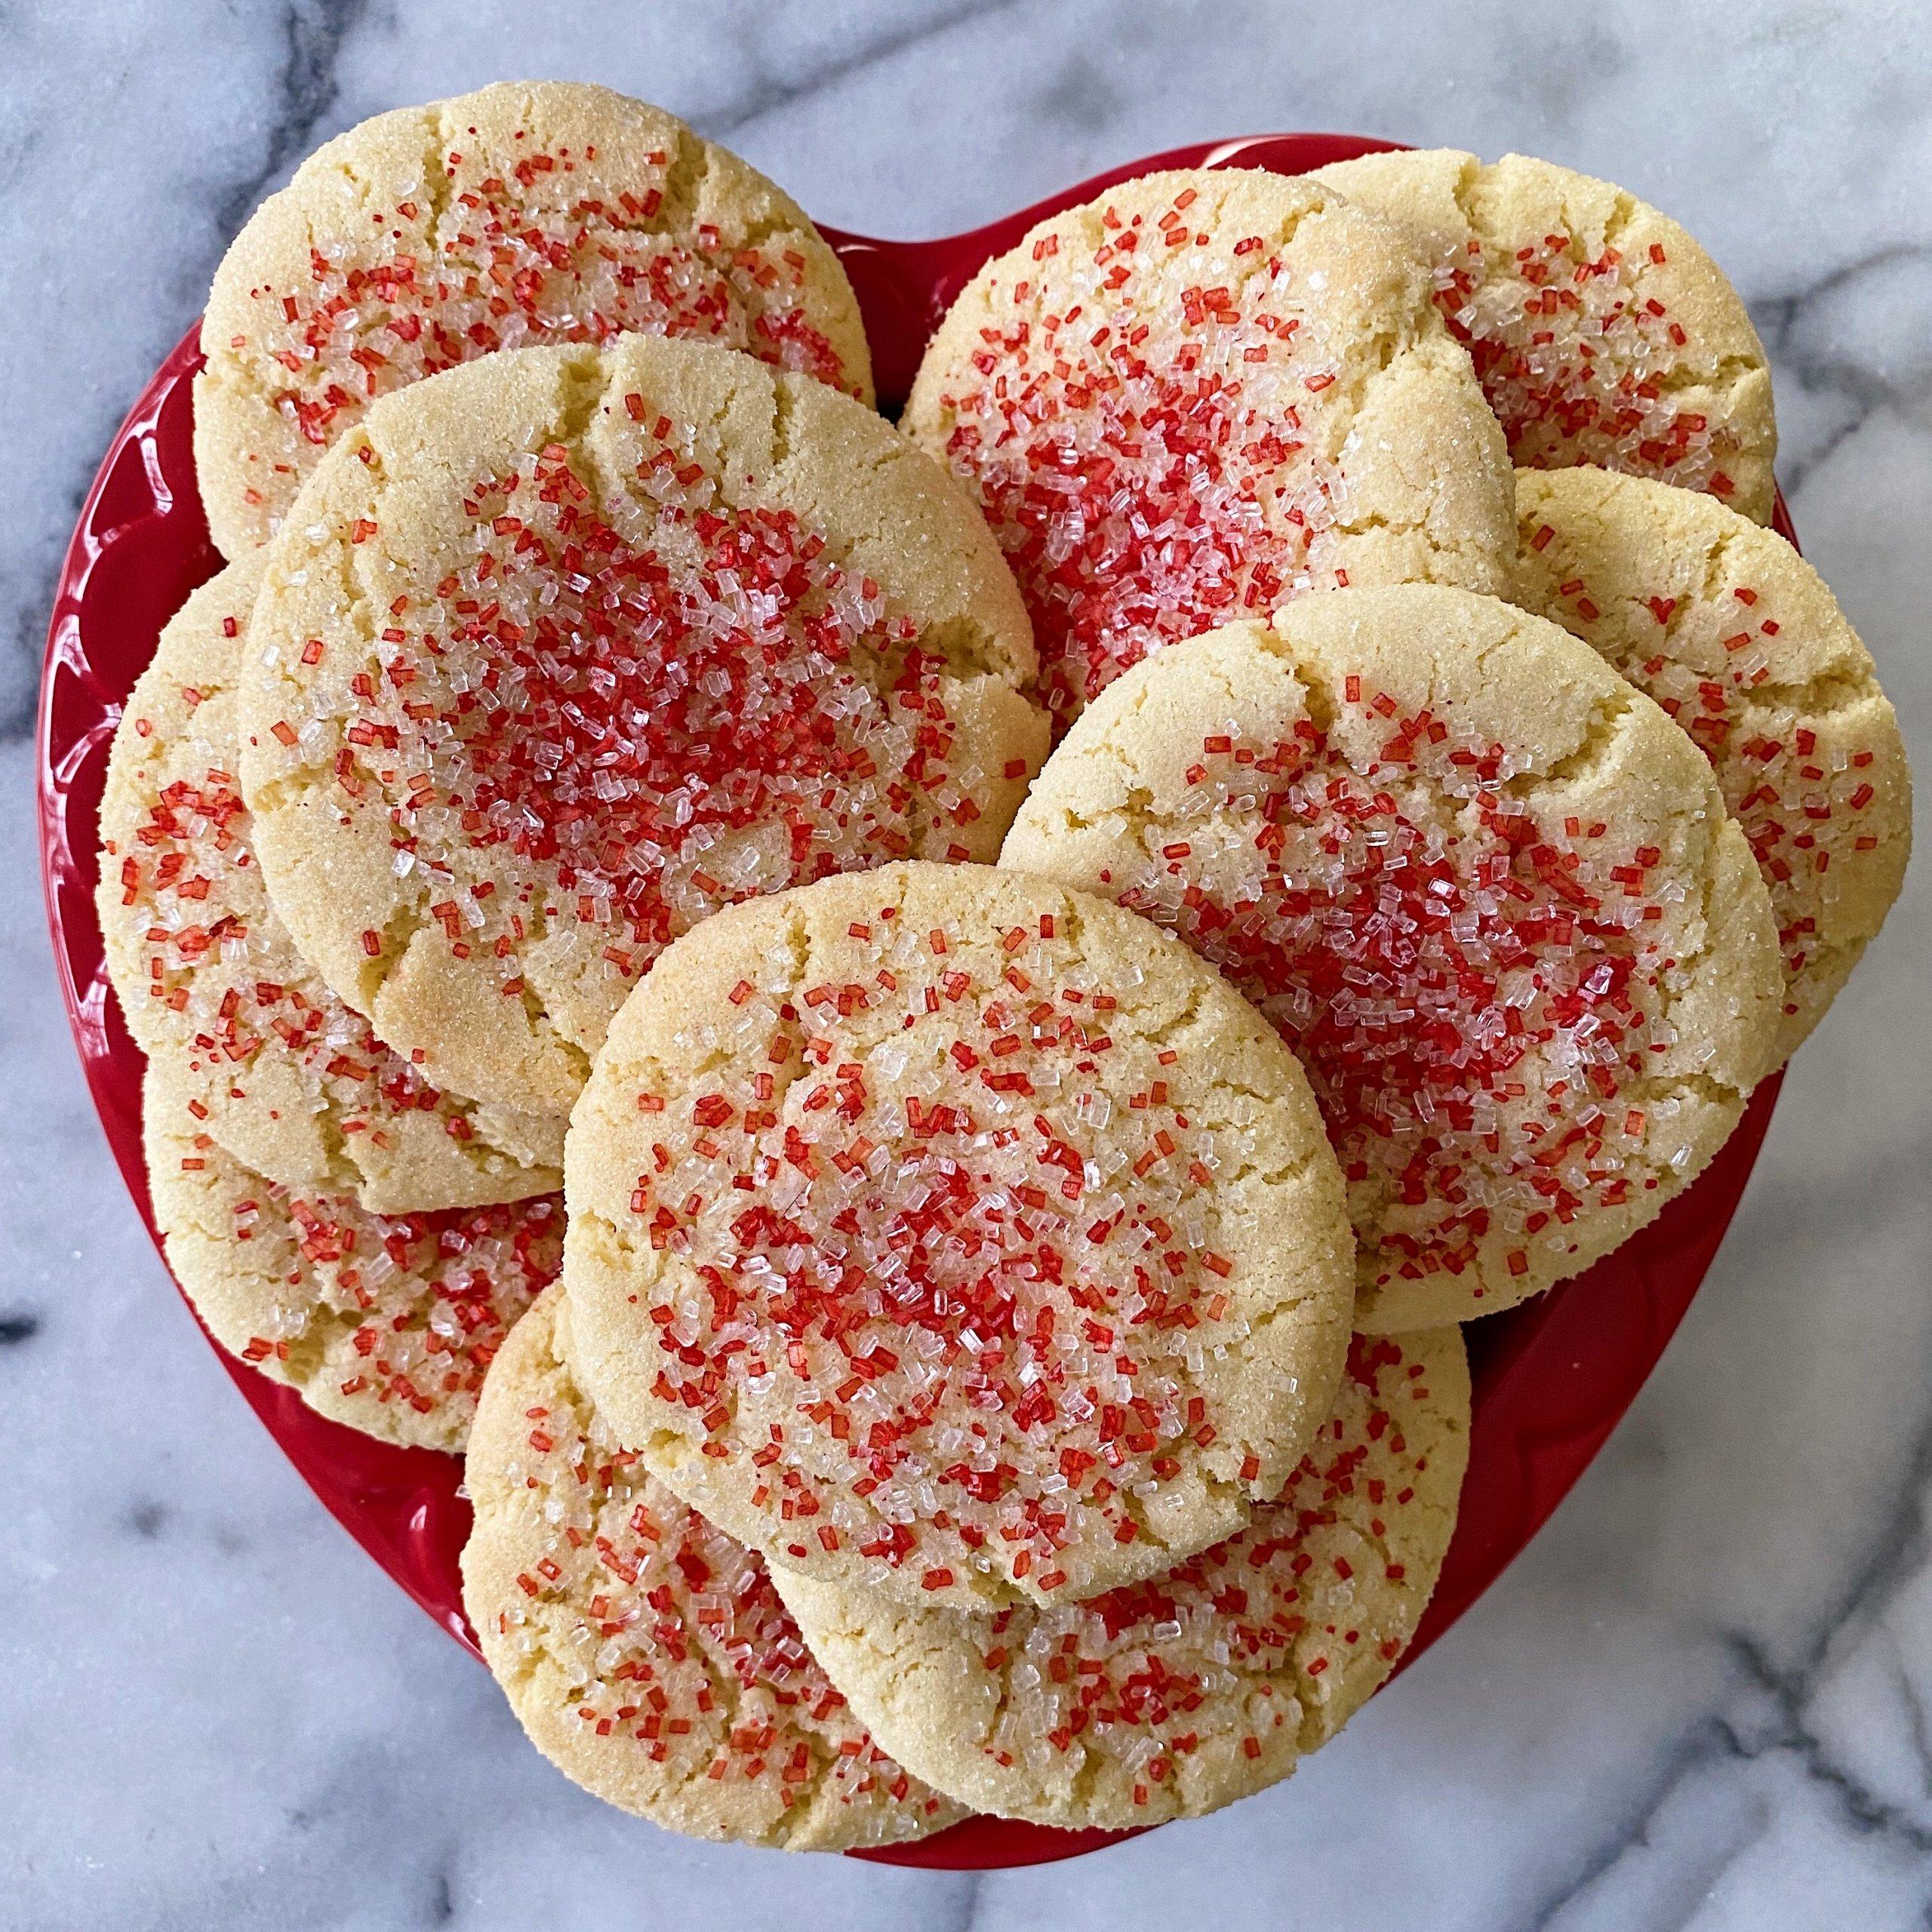 gluten free sugar cookies #glutenfree #glutenfreerecipes www.healthygffamily.com